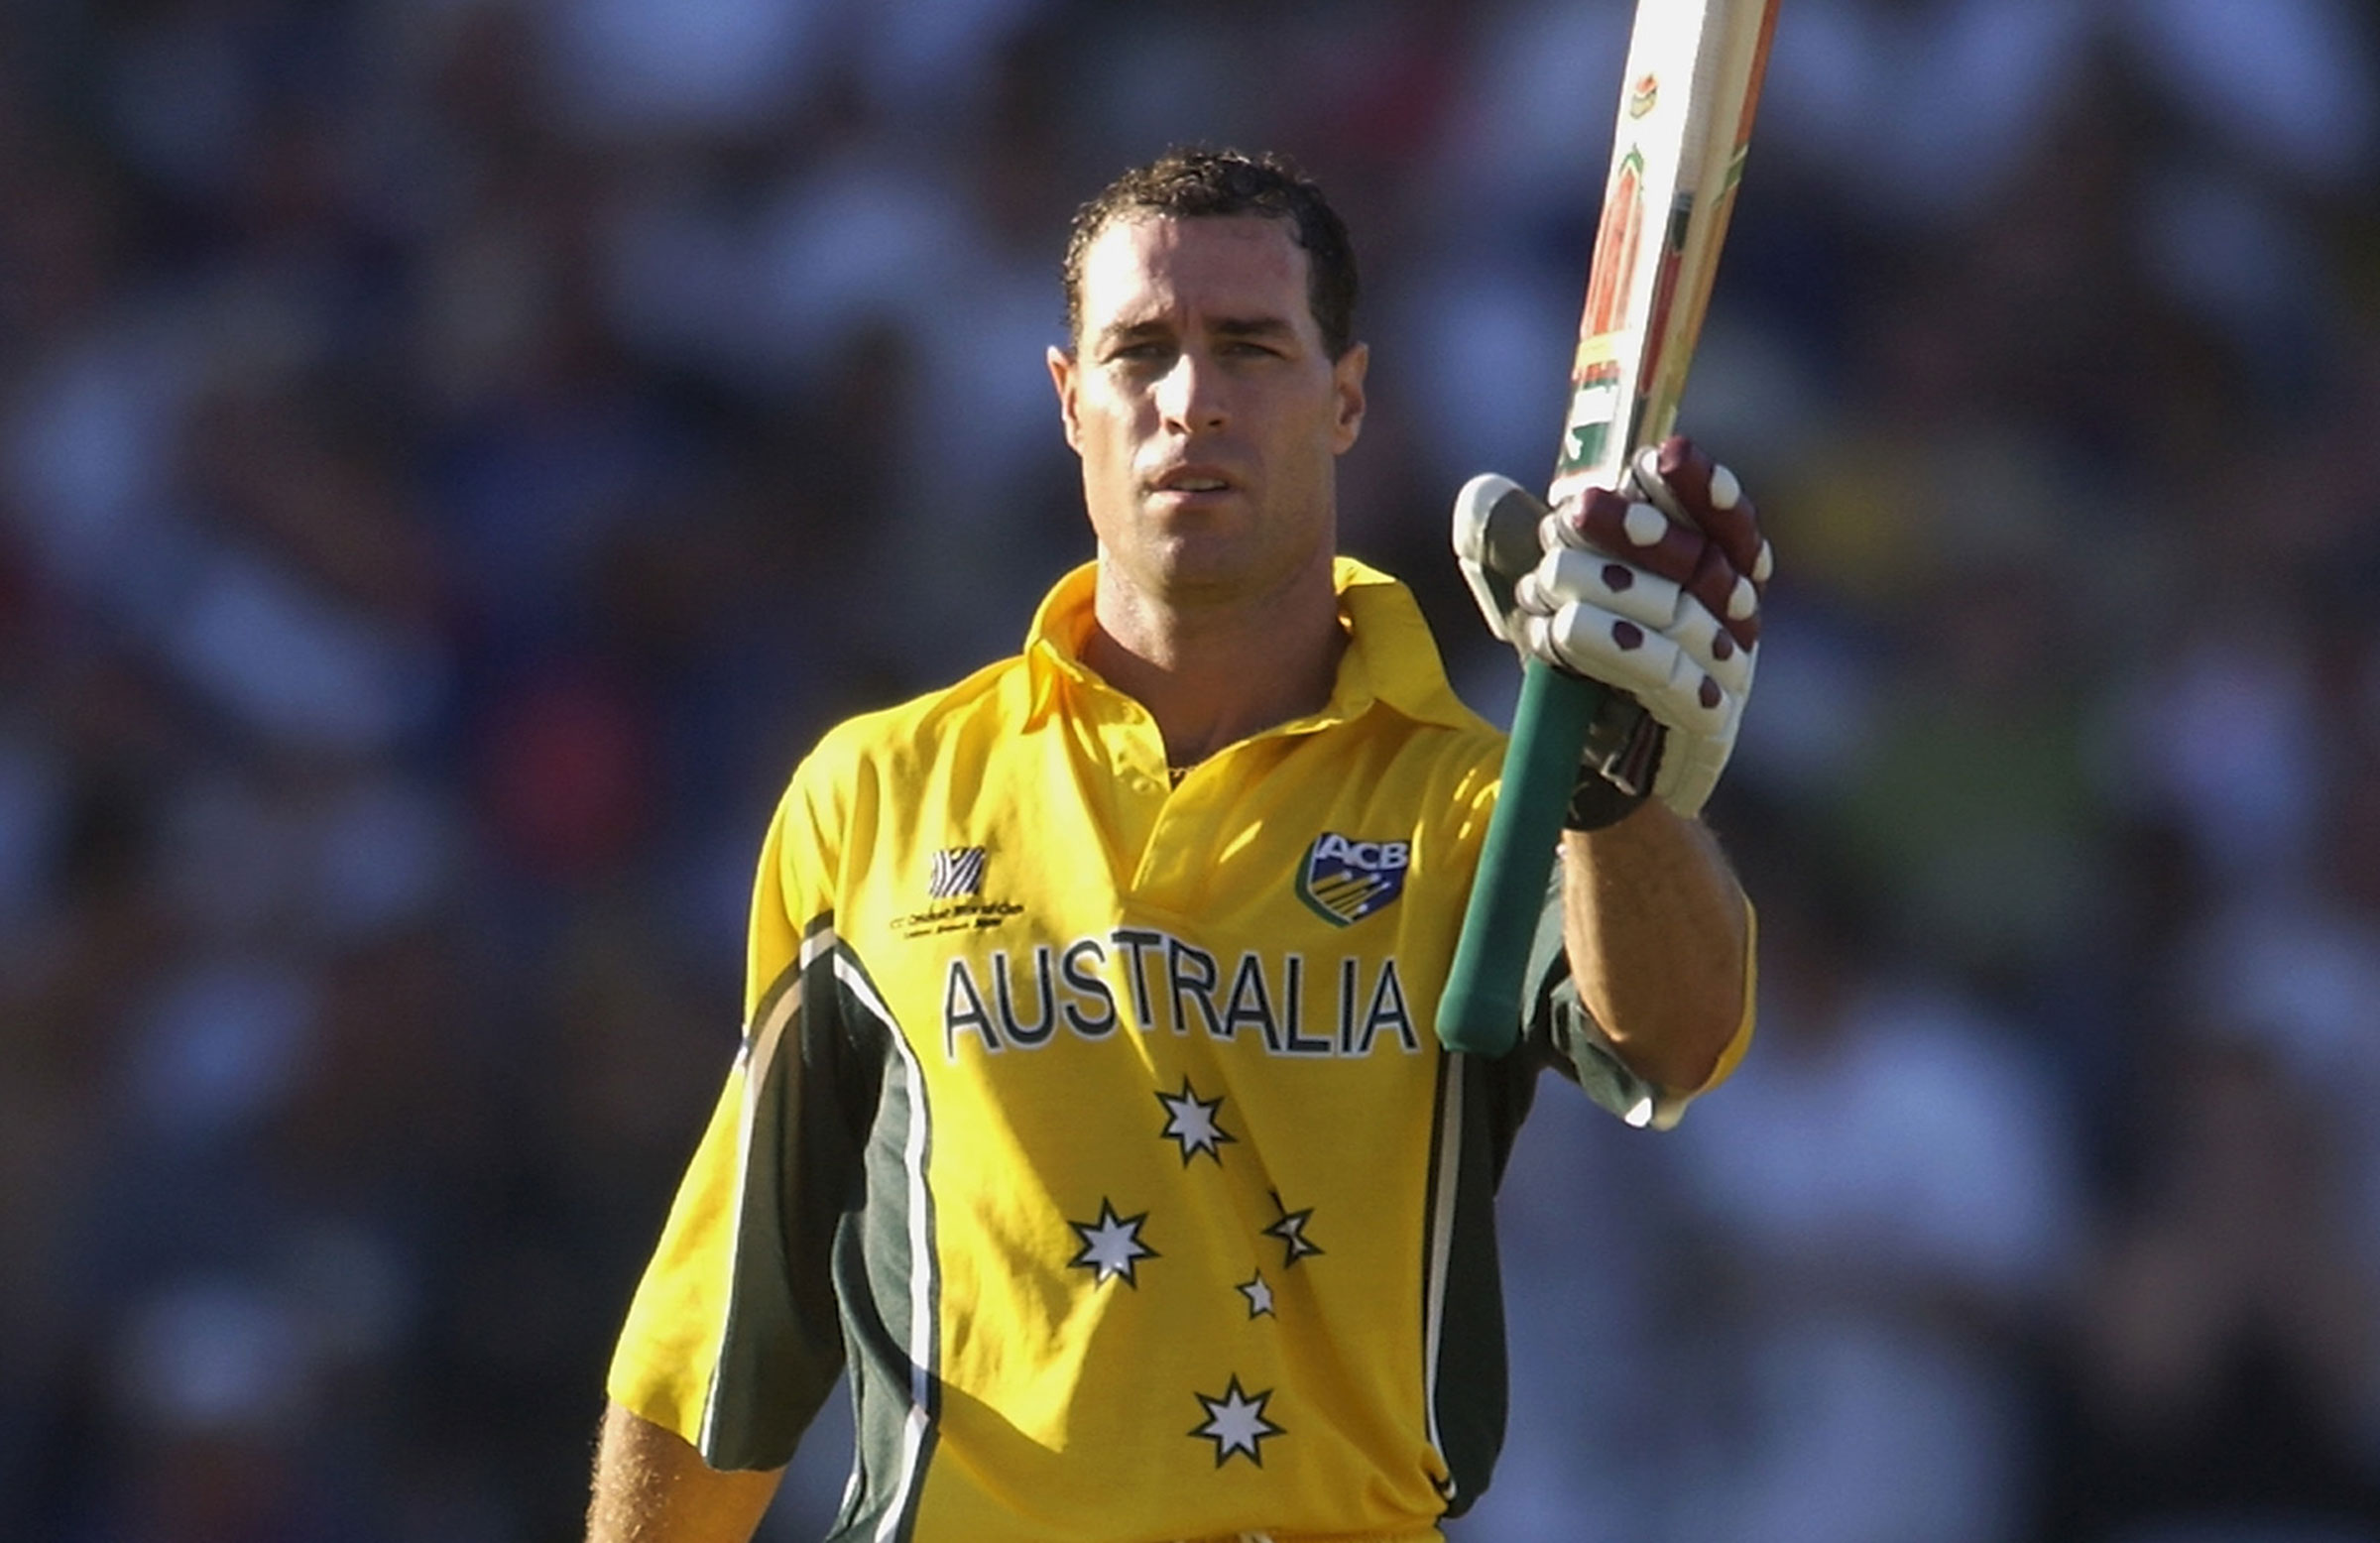 Bevan clarifies coaching credentials | cricket.com.au